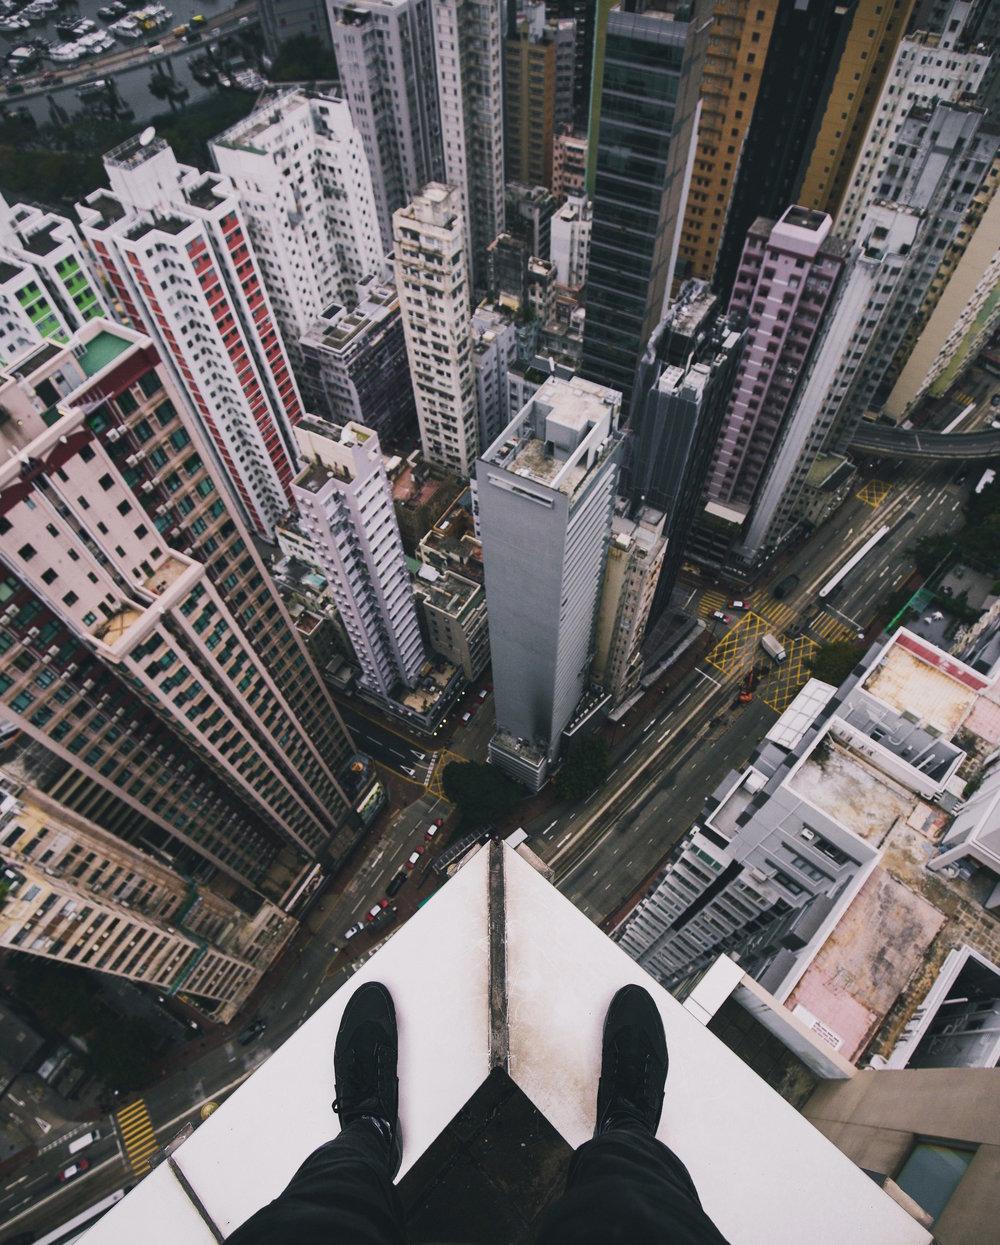 alen-palander-hong-kong-top-of-building-looking-down.jpg